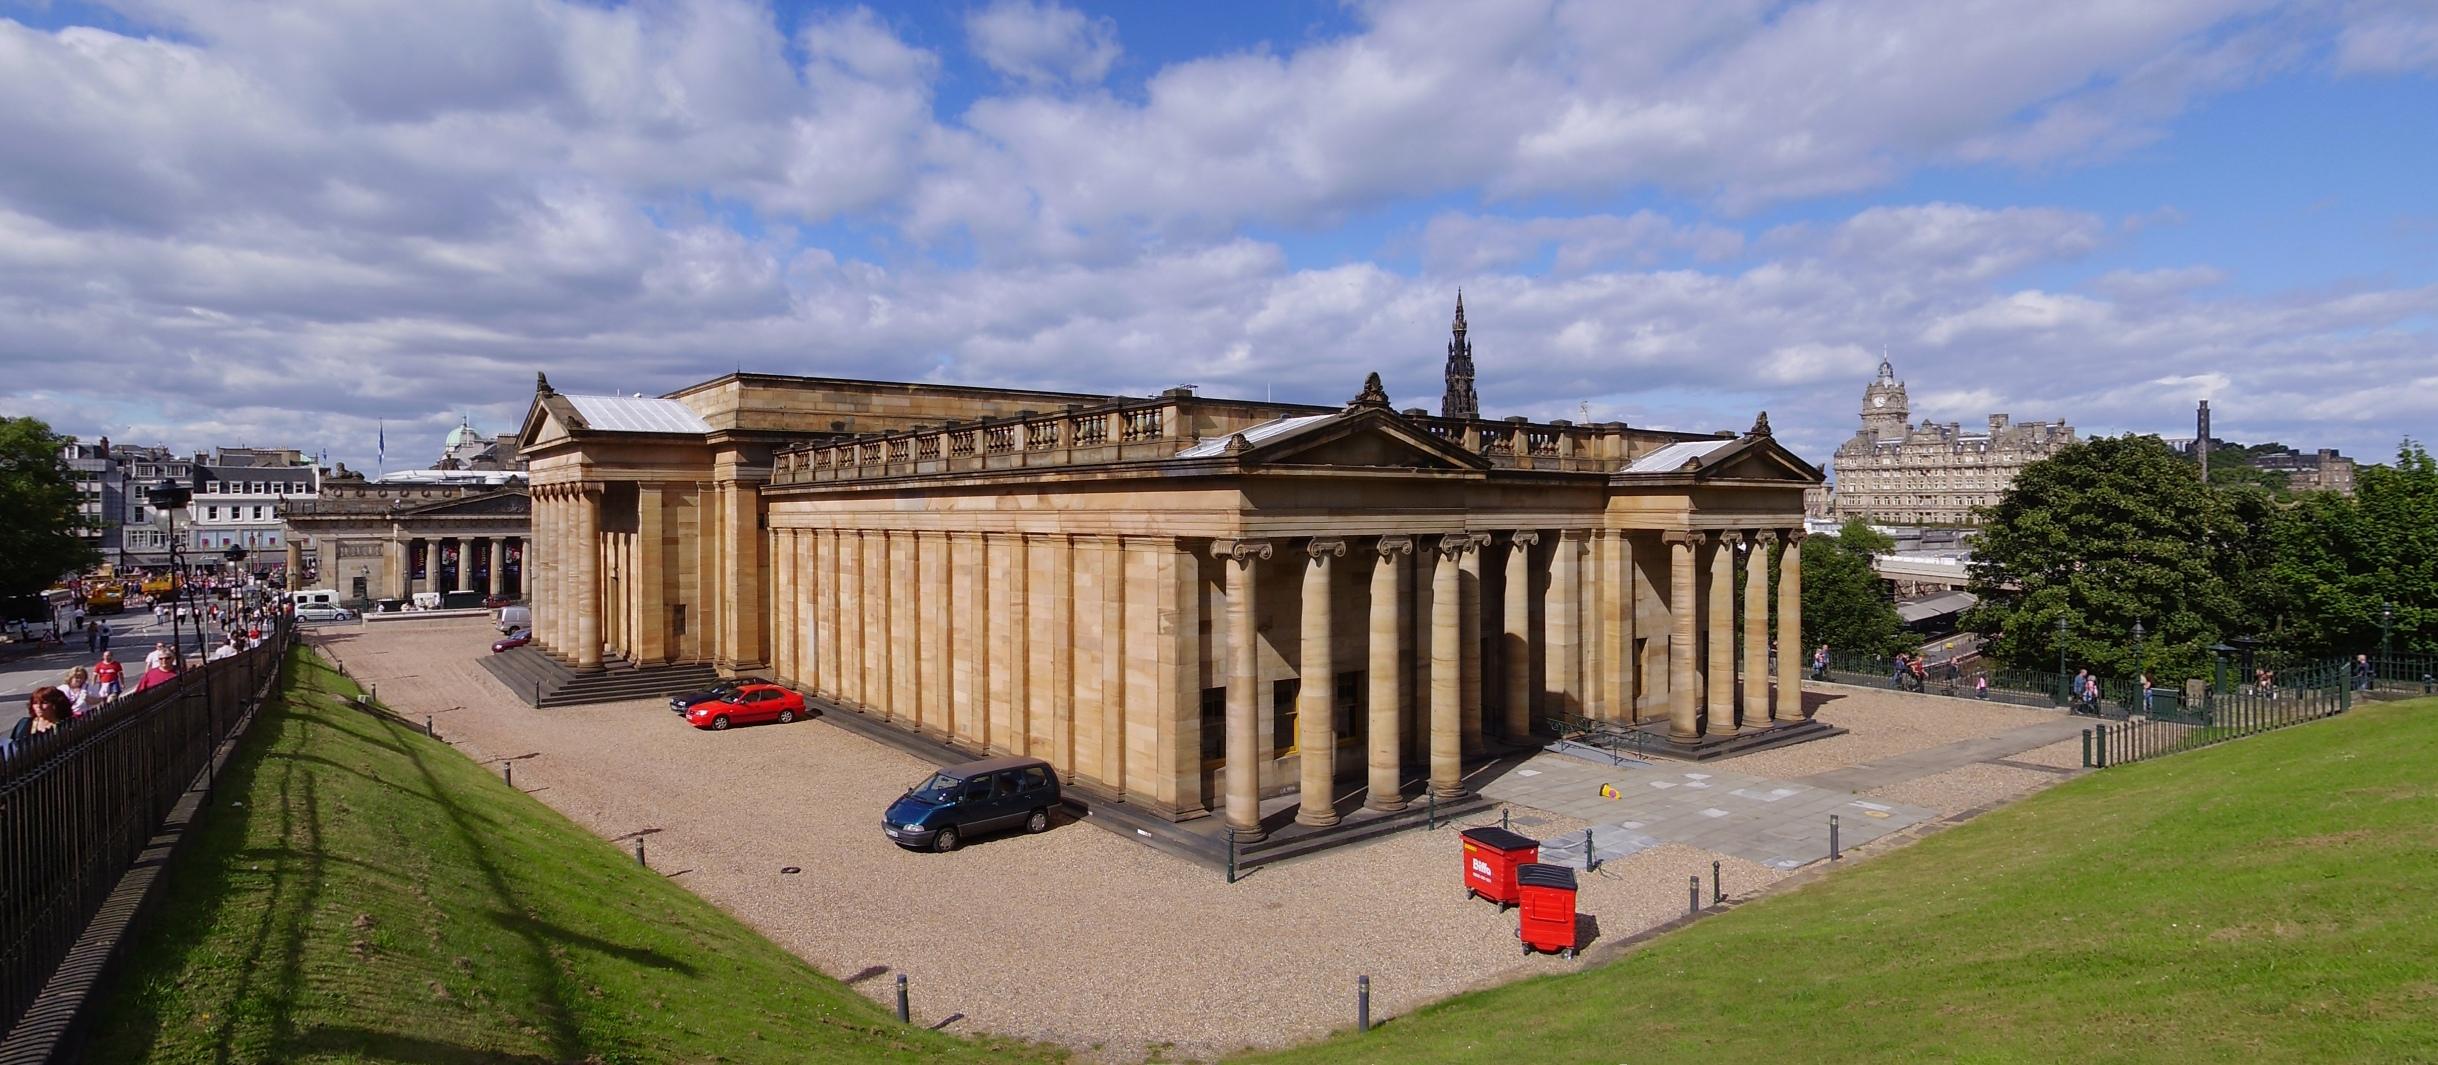 Visitas gratuitas en Edimburgo